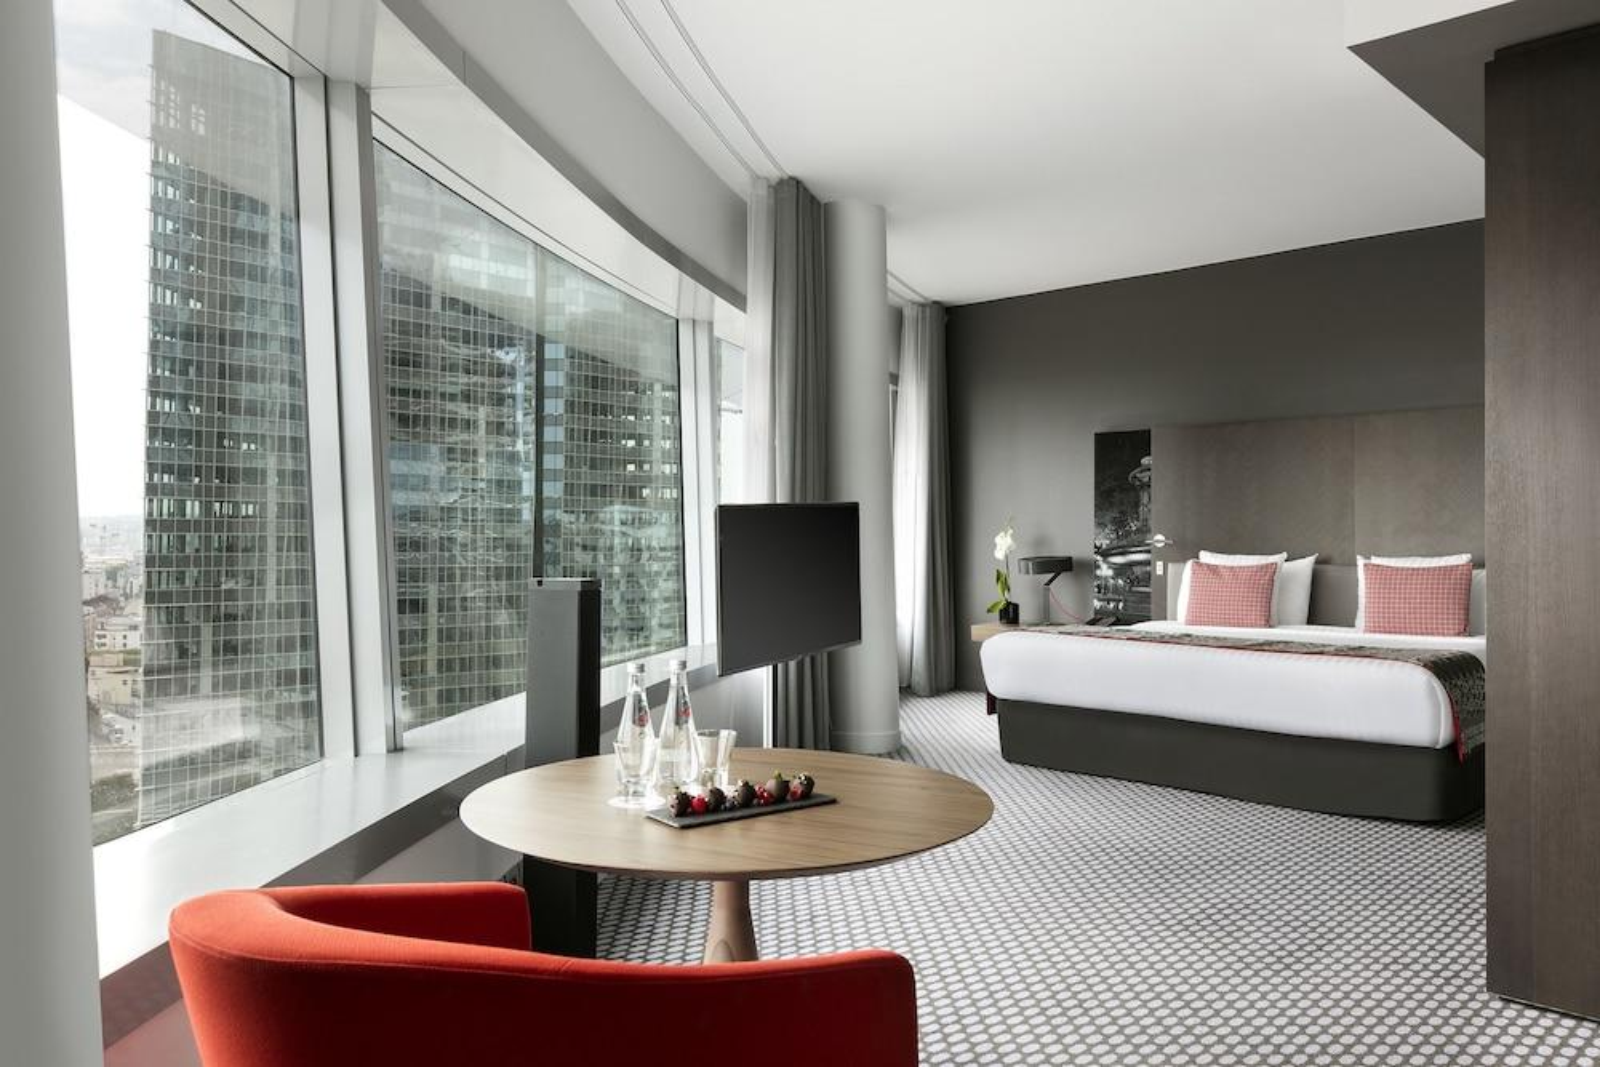 ofertas fin de semana en courbevoie ofertas de escapadas. Black Bedroom Furniture Sets. Home Design Ideas